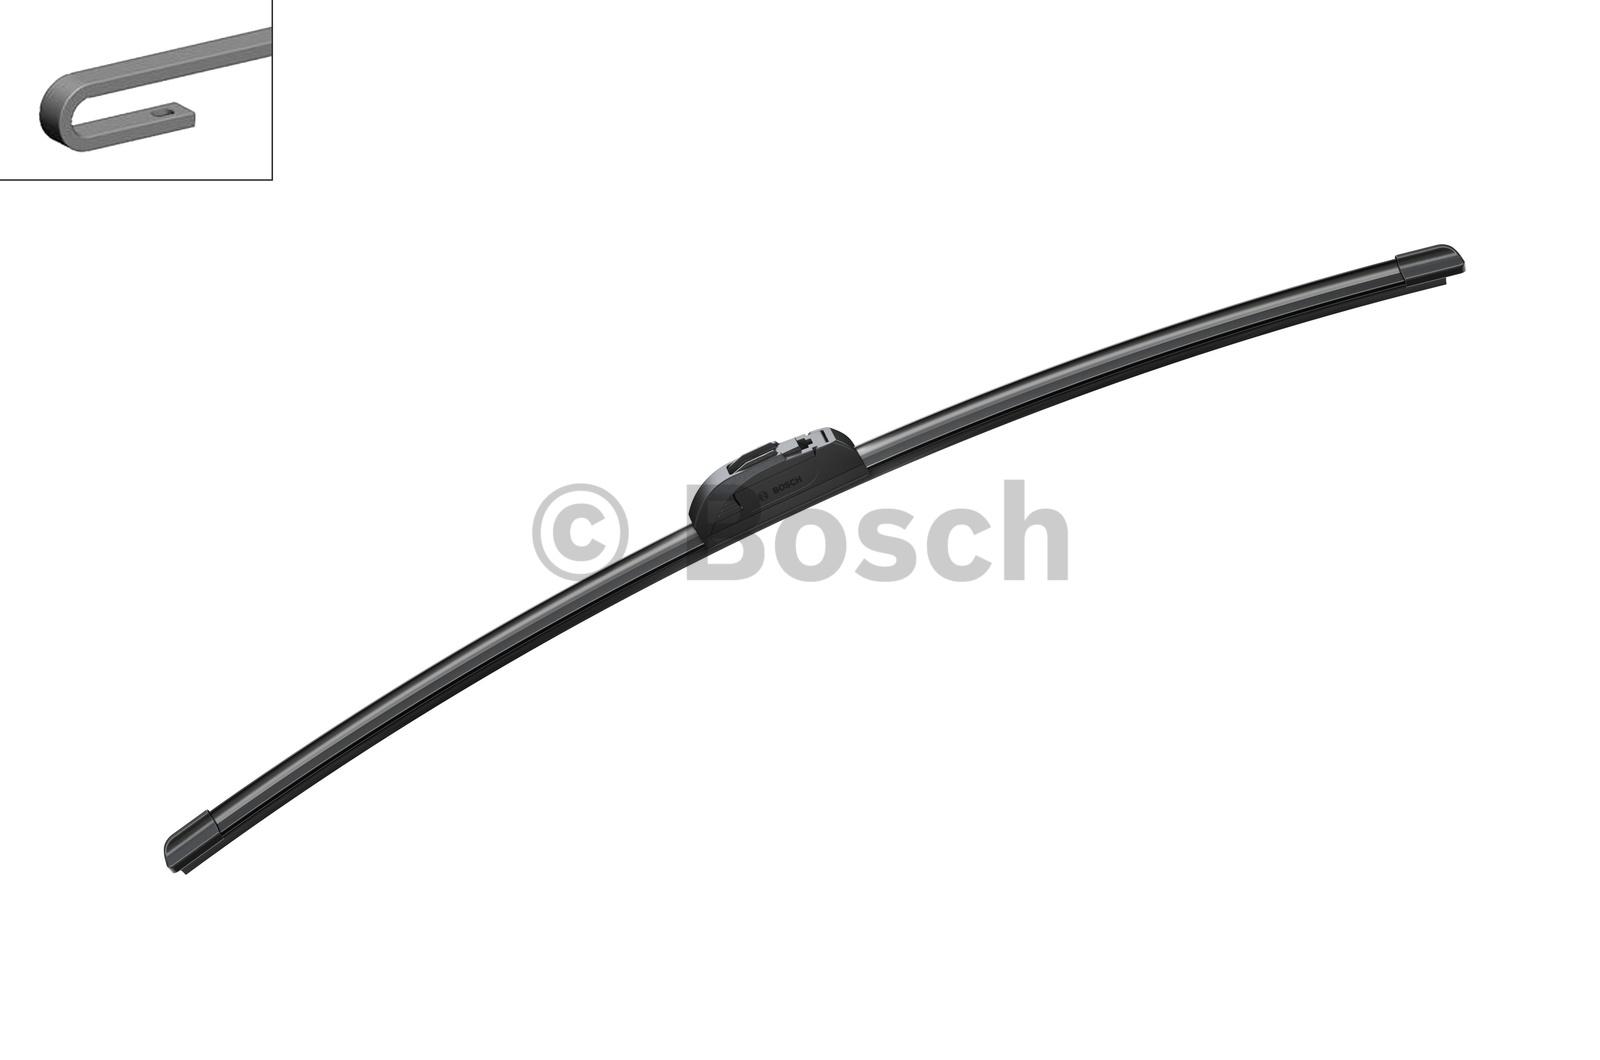 Bosch 3397008539 Щетка бескаркасная, крючок, 650мм